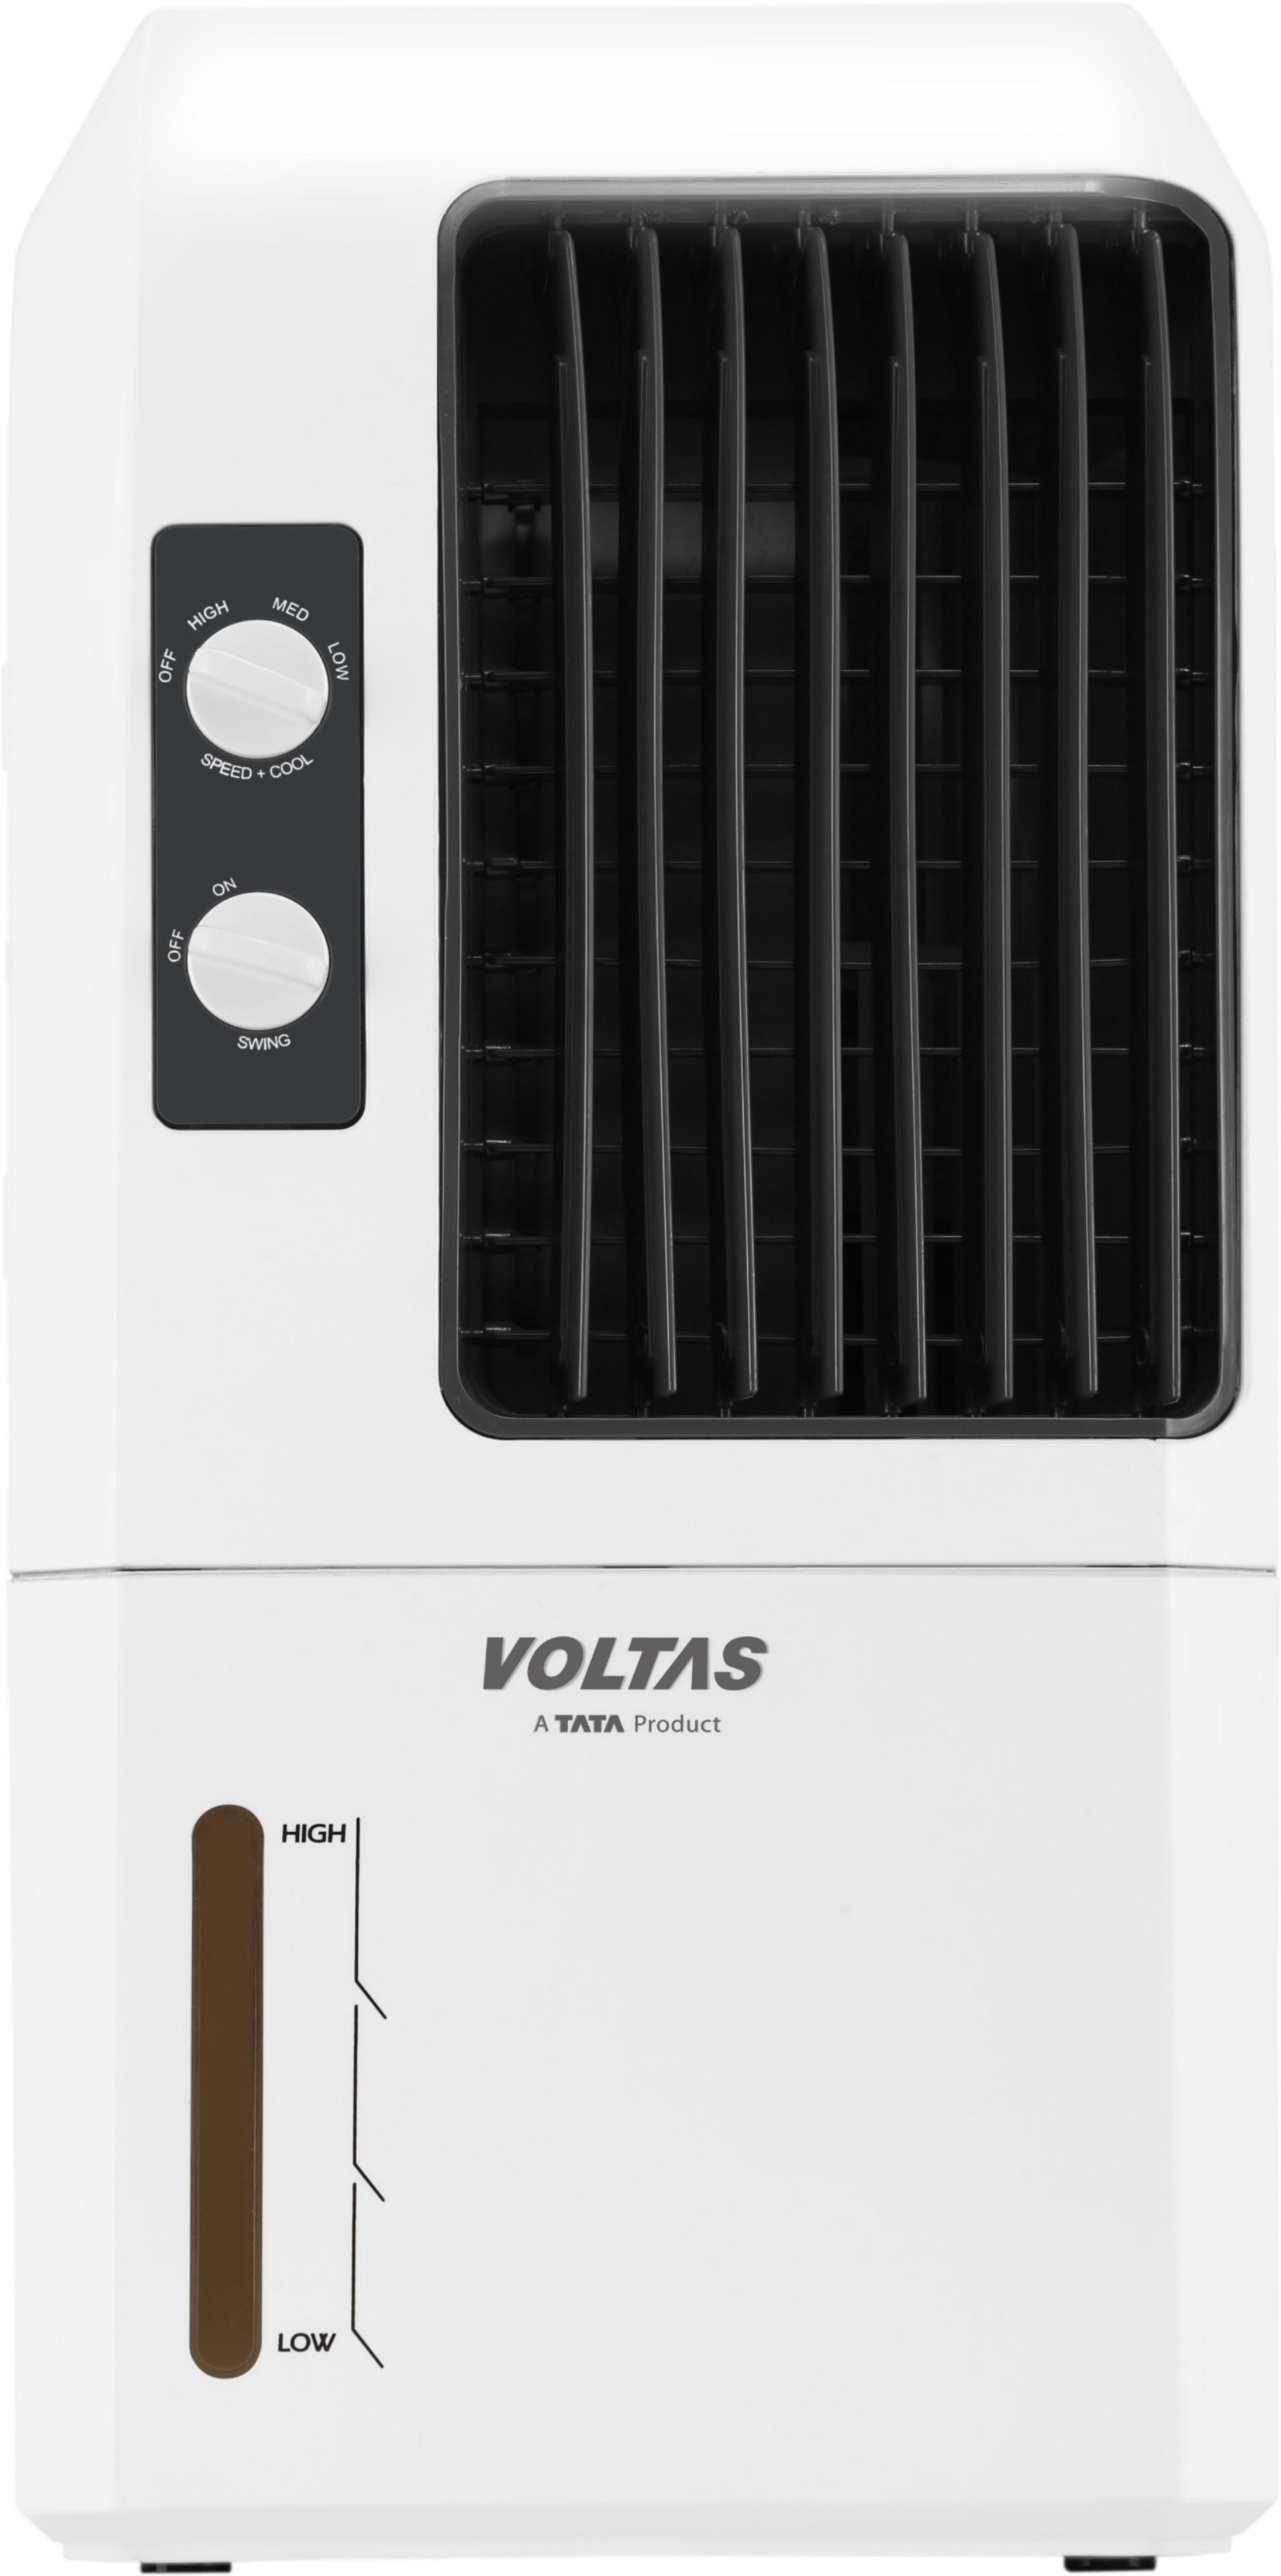 Voltas VJ P15MH Personal Air Cooler Image